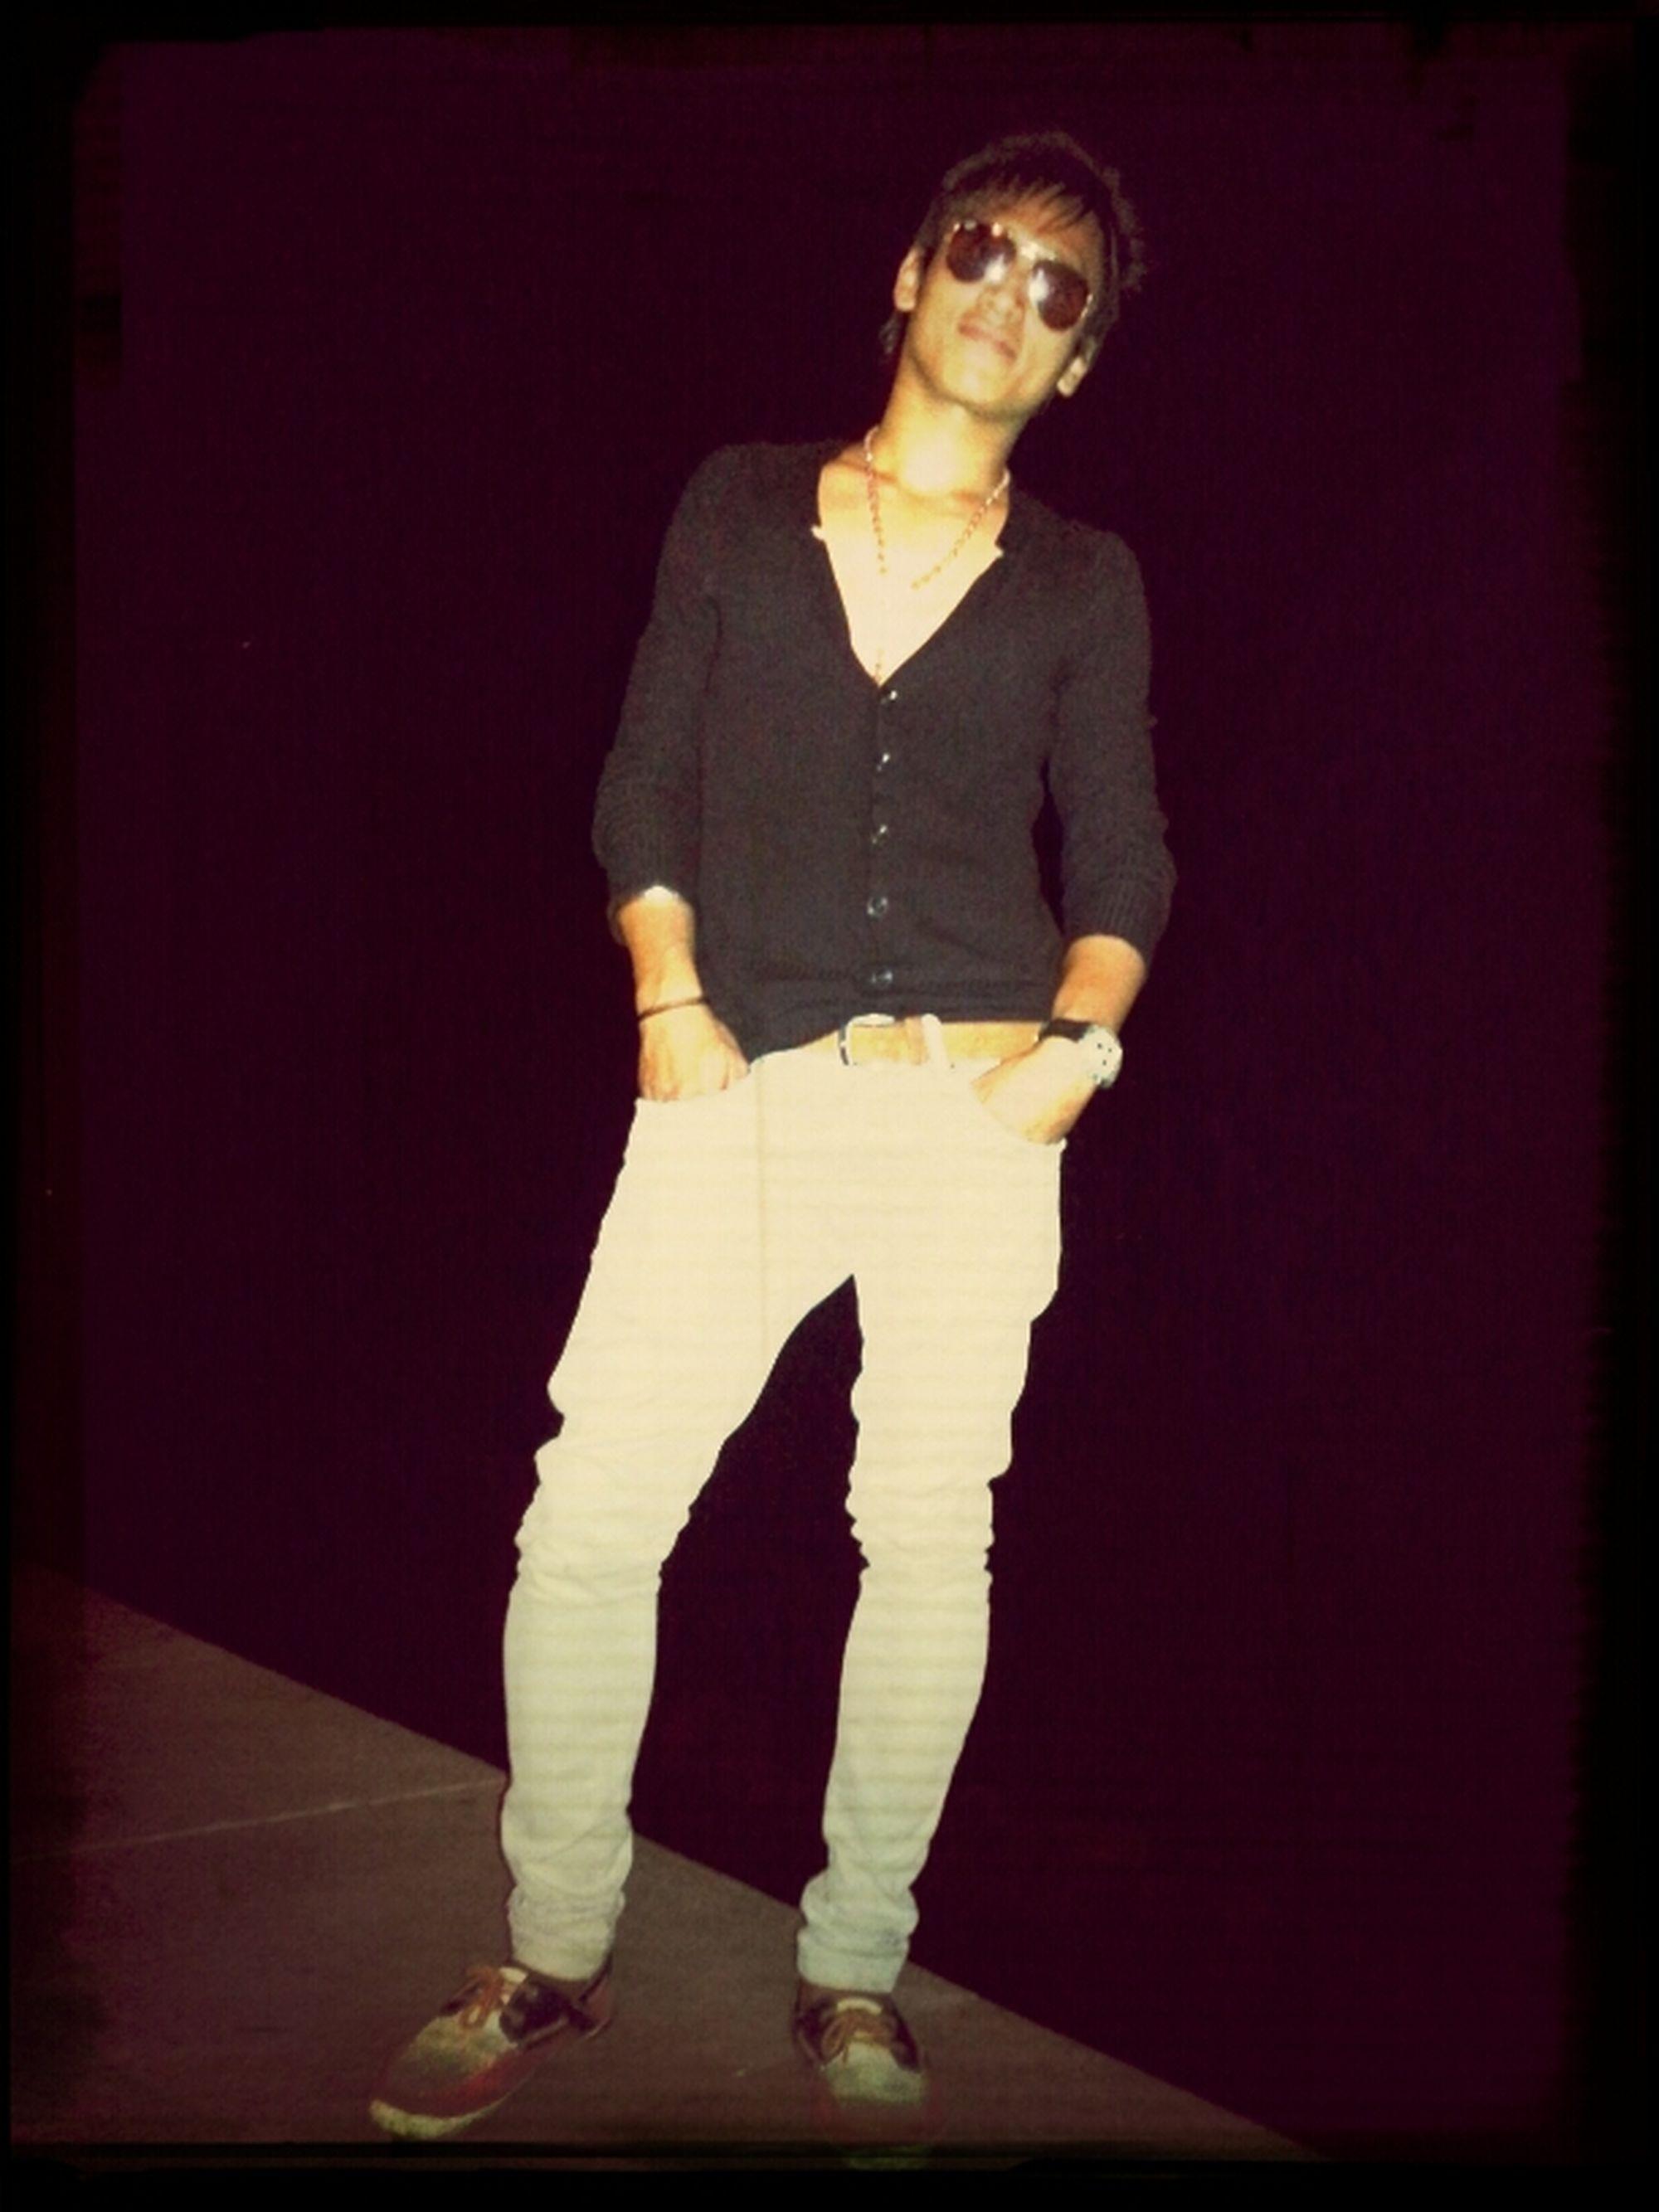 my style is ma fashion.......♡♡♡ Working Hard